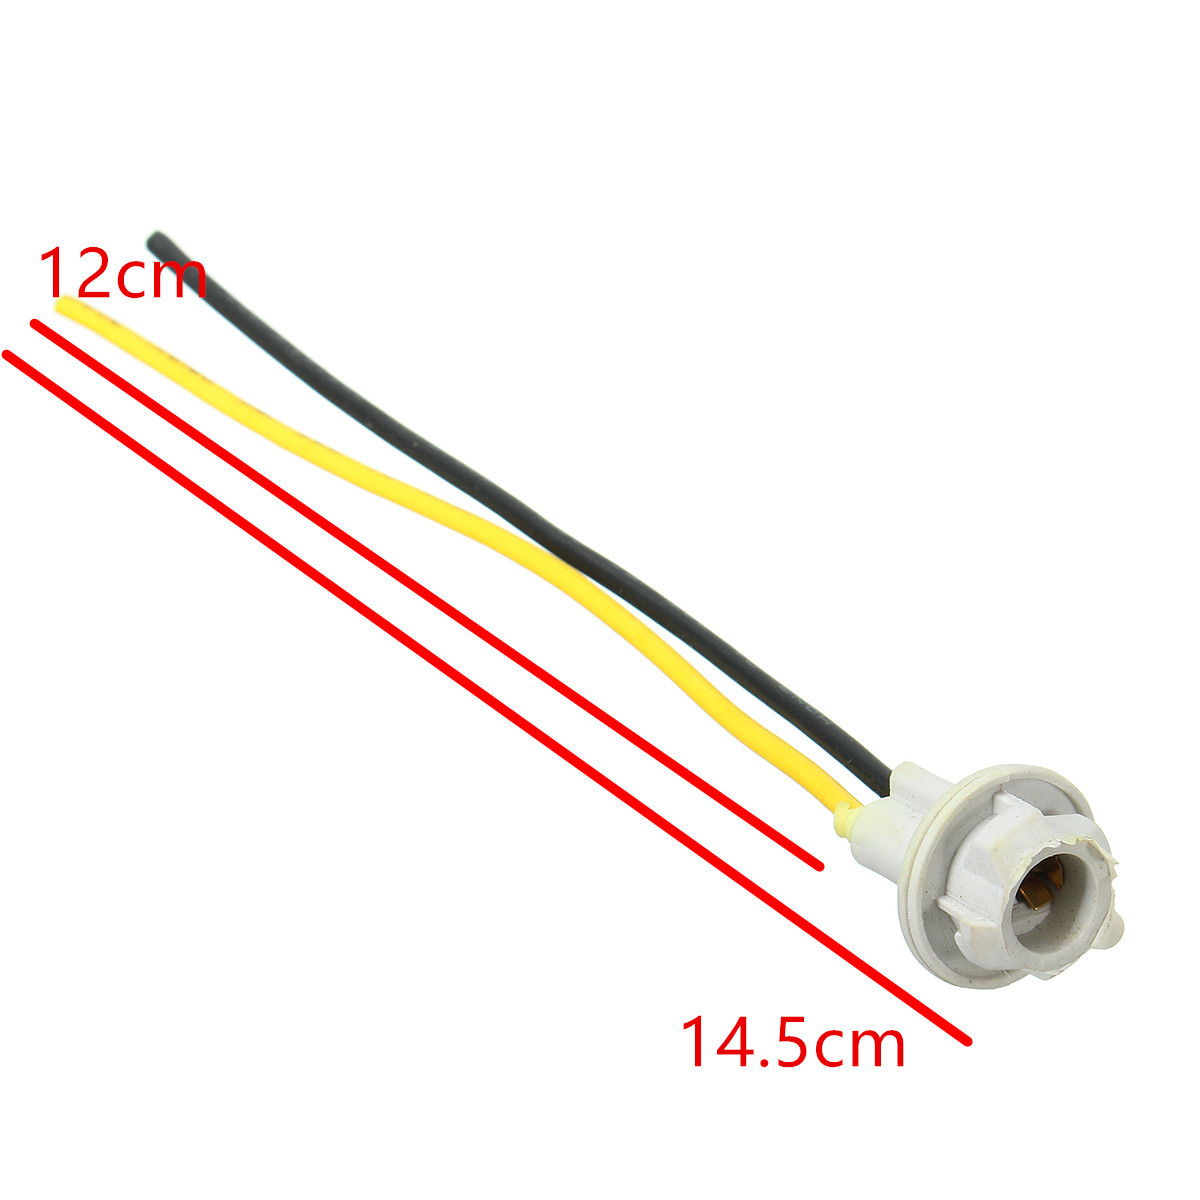 5 Stücke T10 Stecker 12 CM W5W 168 194 Auto Lampe Kabel Auto birne ...